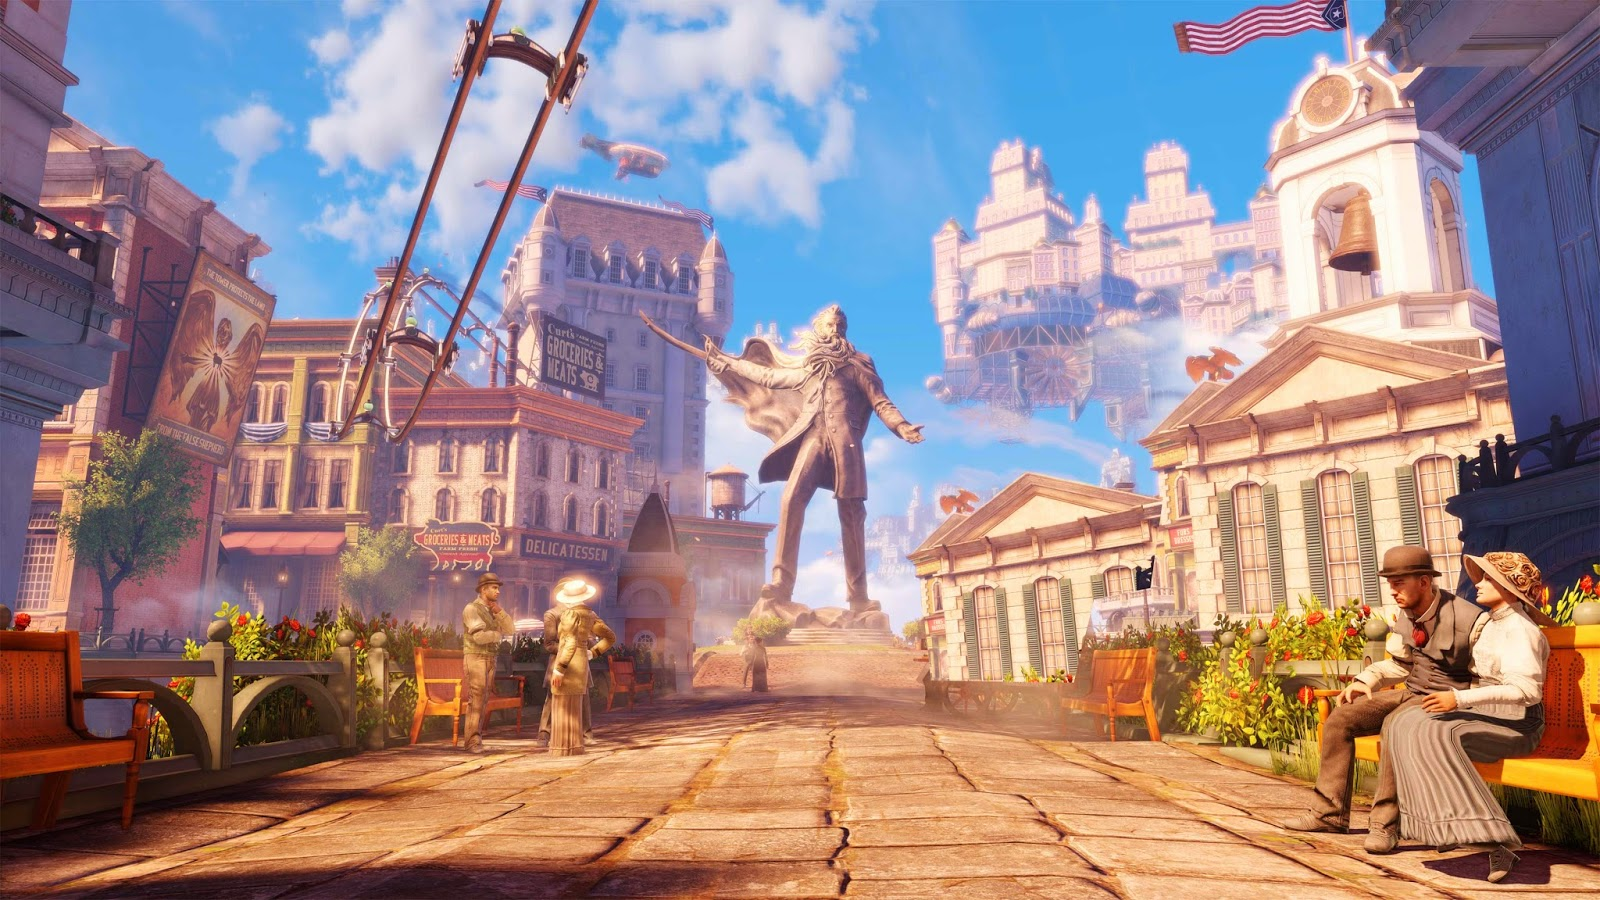 Bioshock Infinite, otro éxito de videojuegos en PC